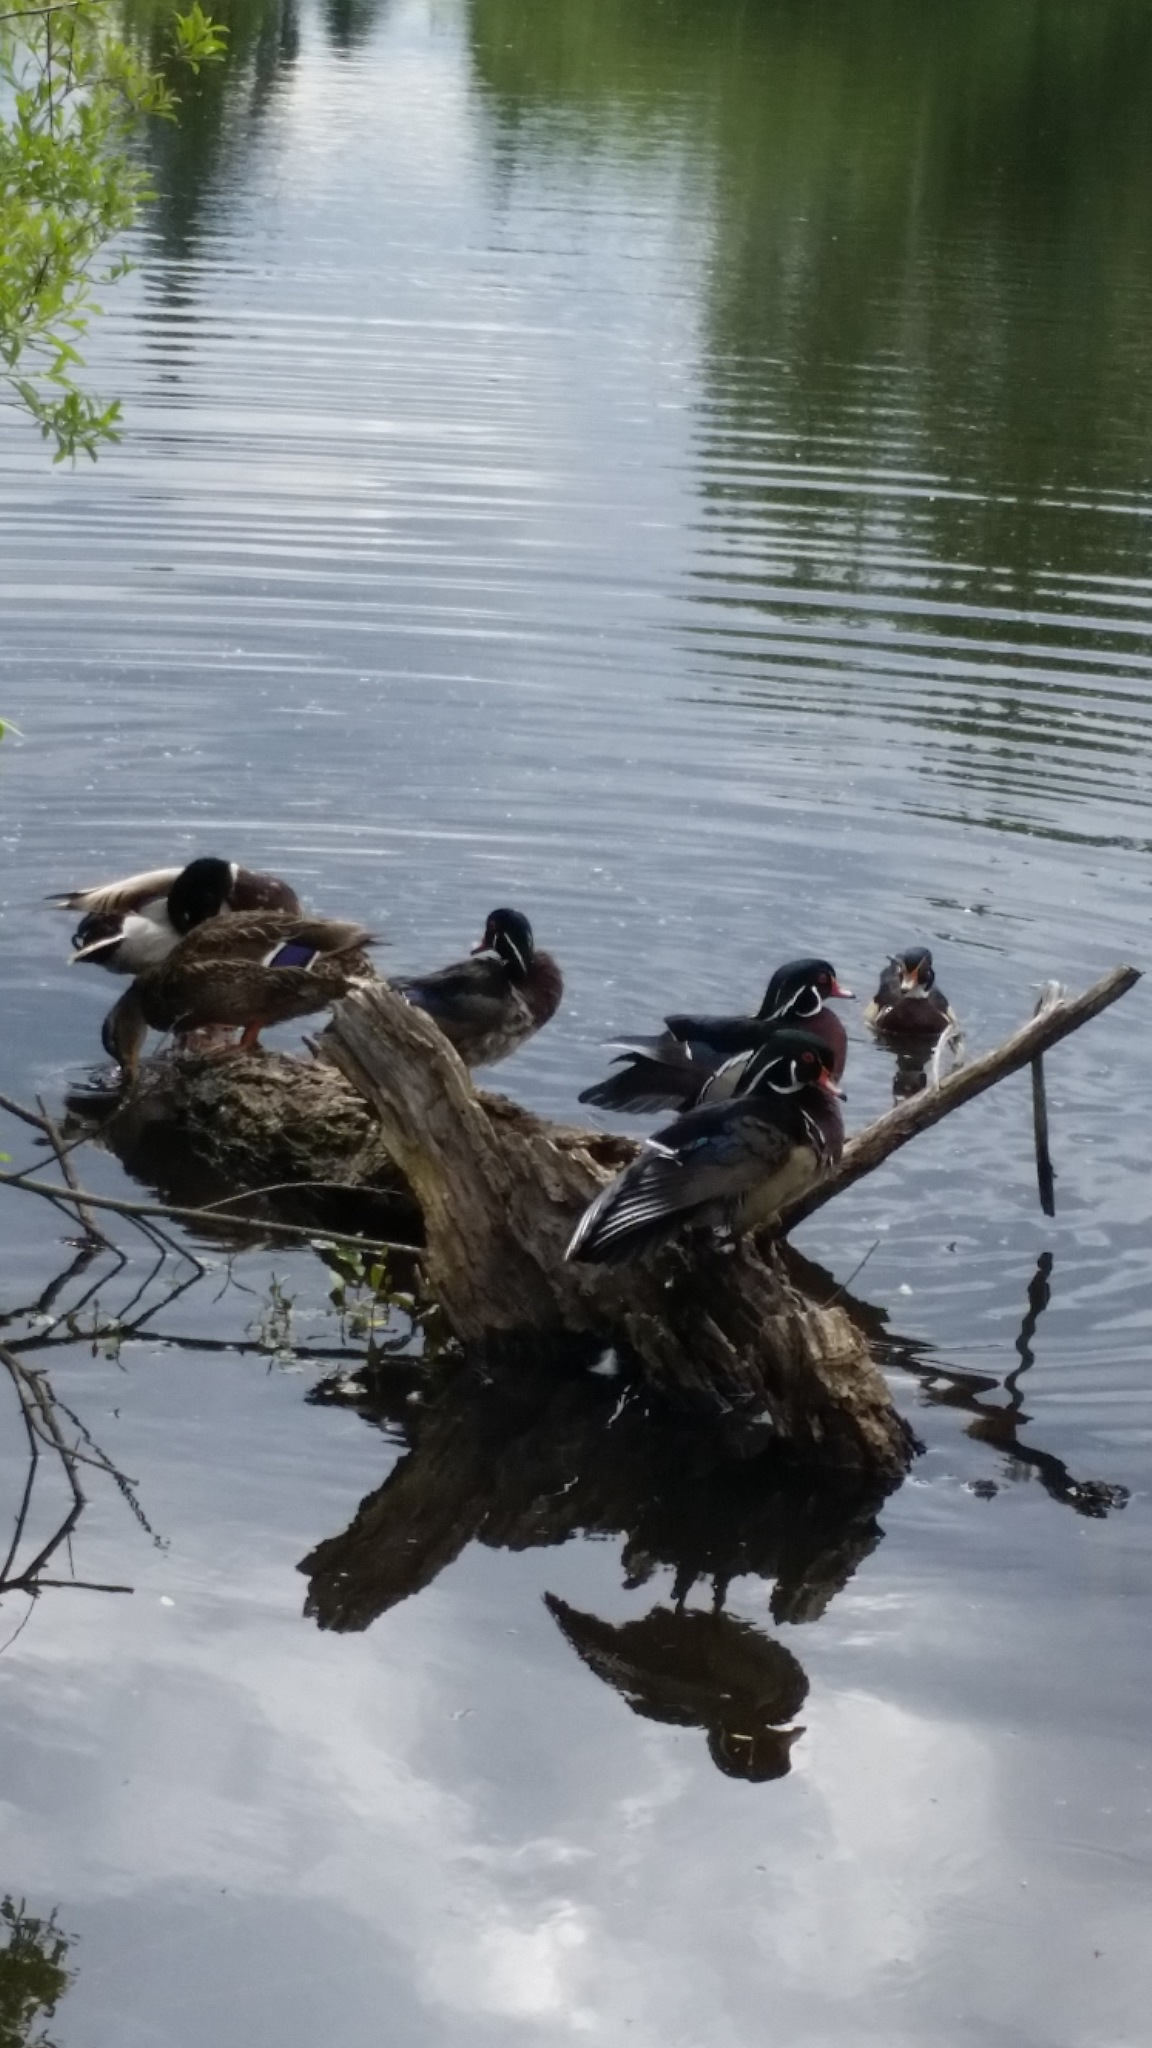 Beautiful quack quack by B56